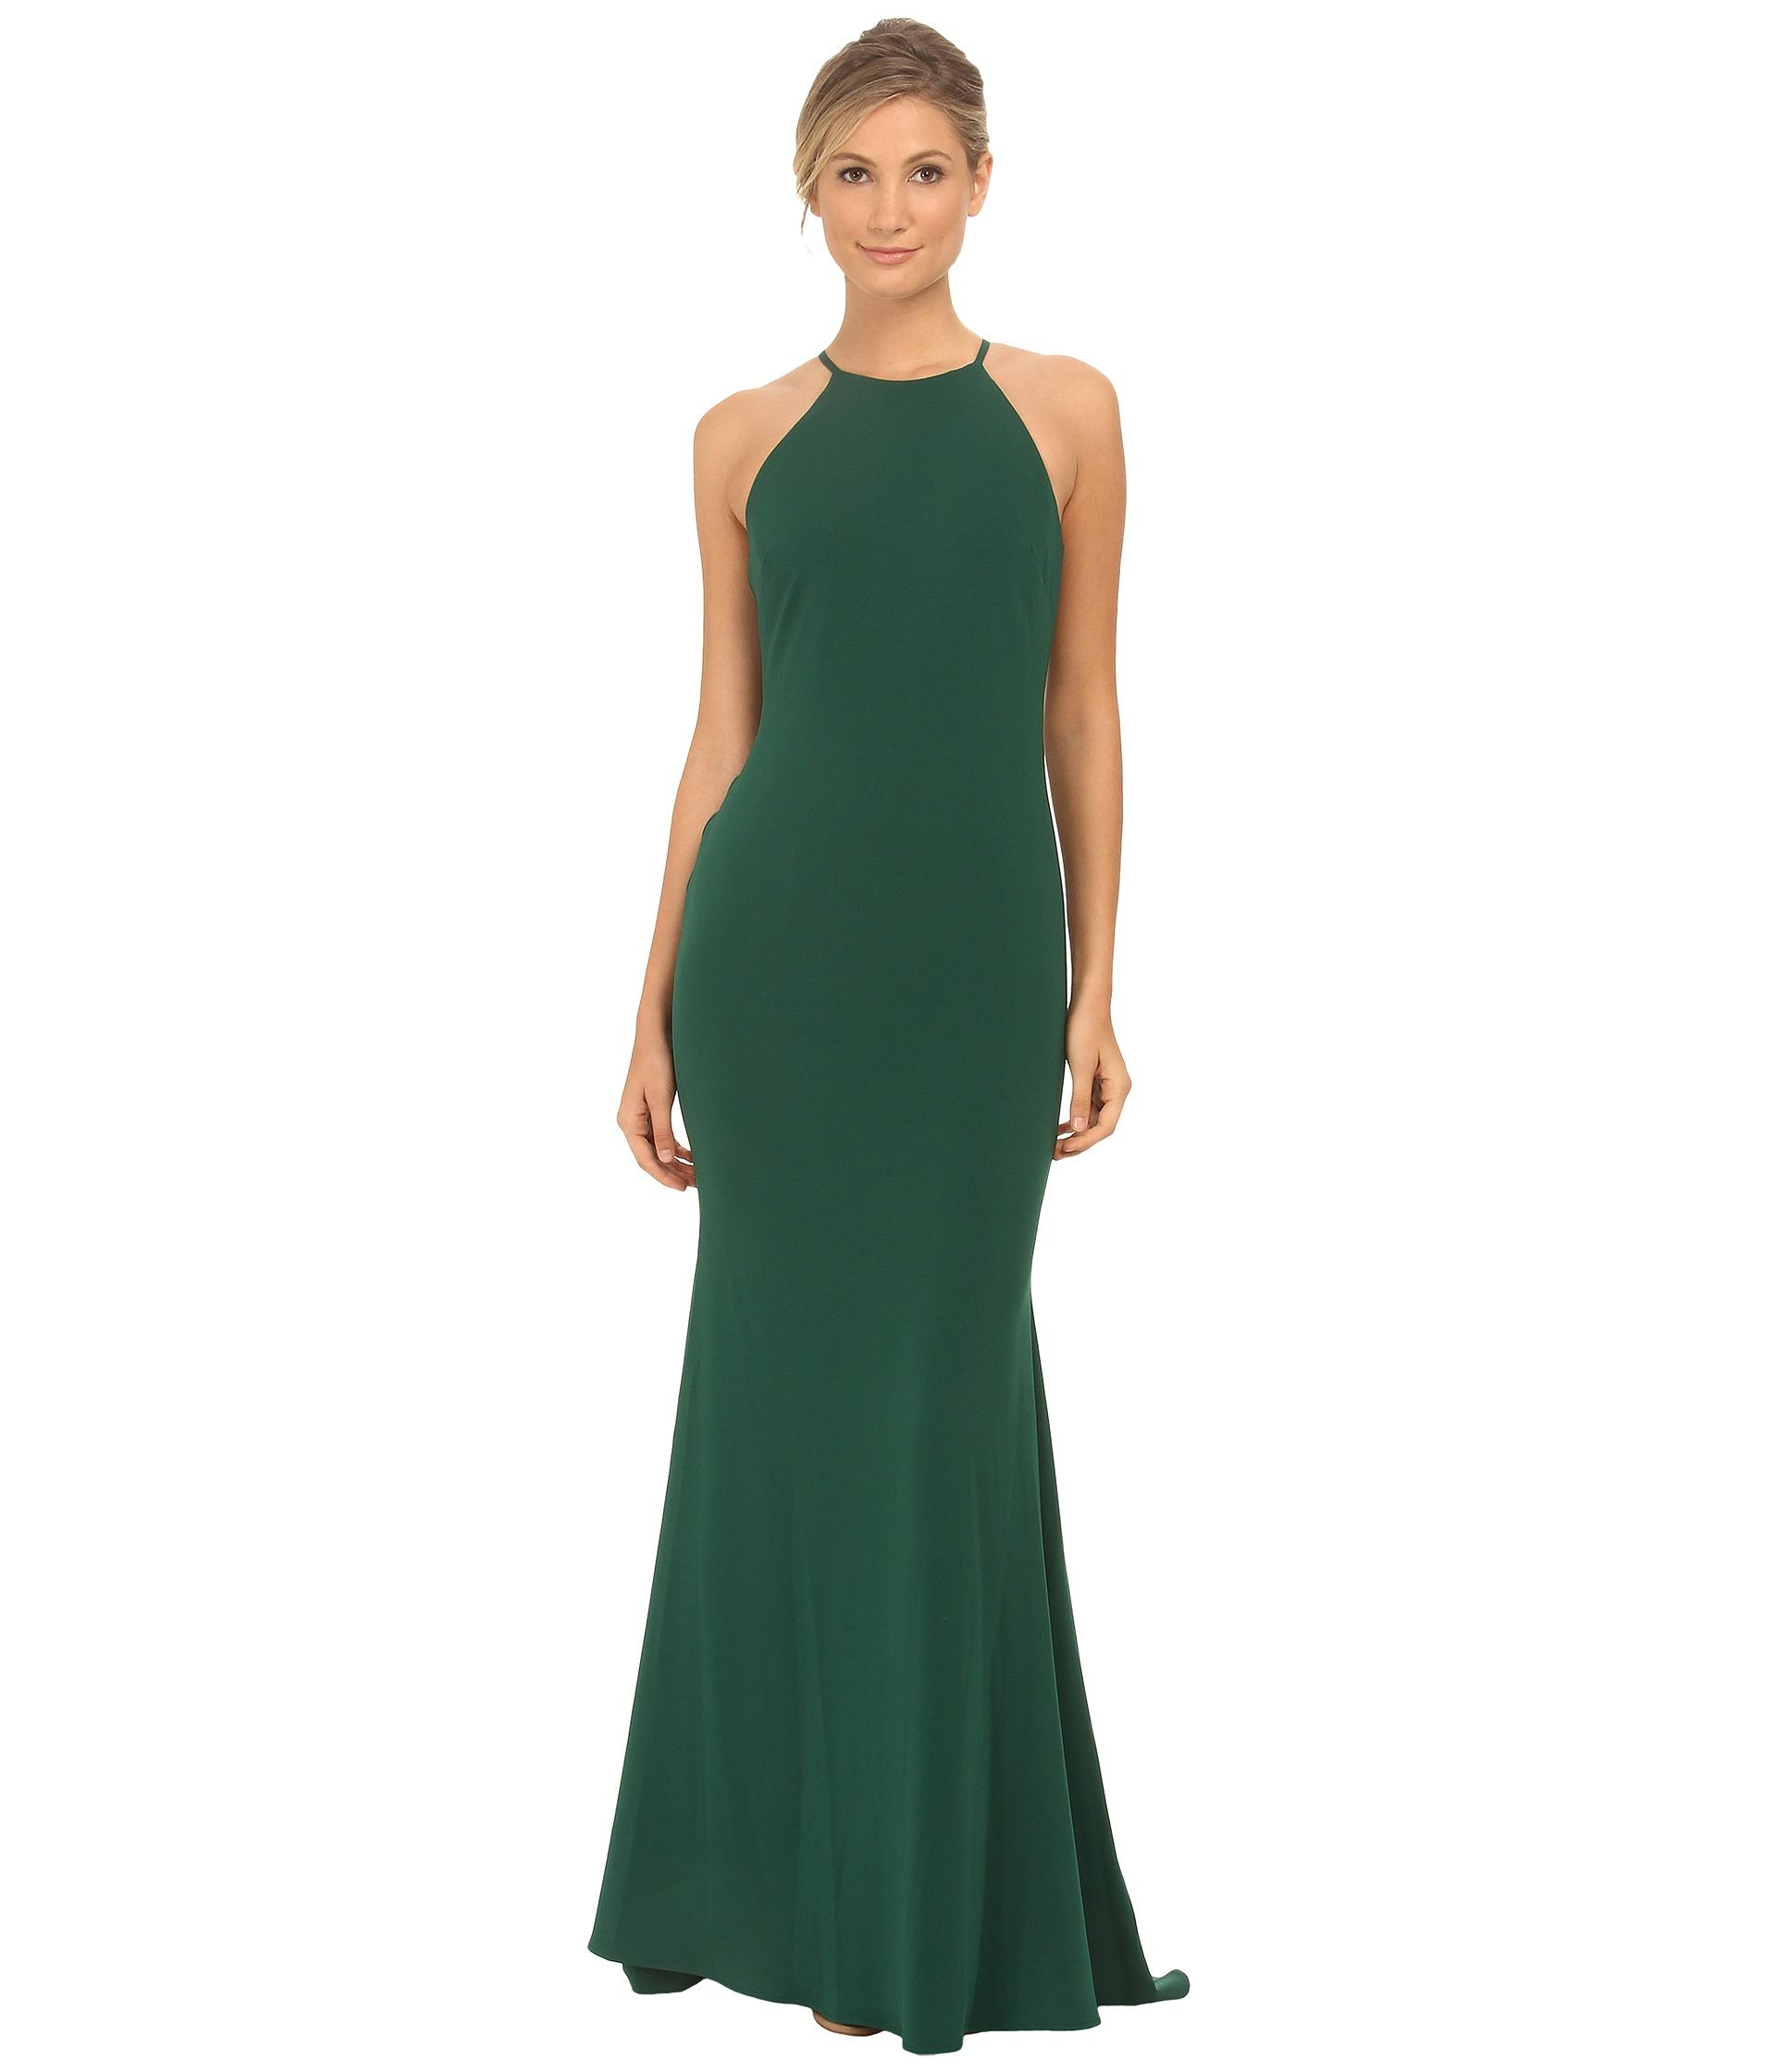 Lyst - Badgley Mischka Stretch Crepe Halter Gown in Green